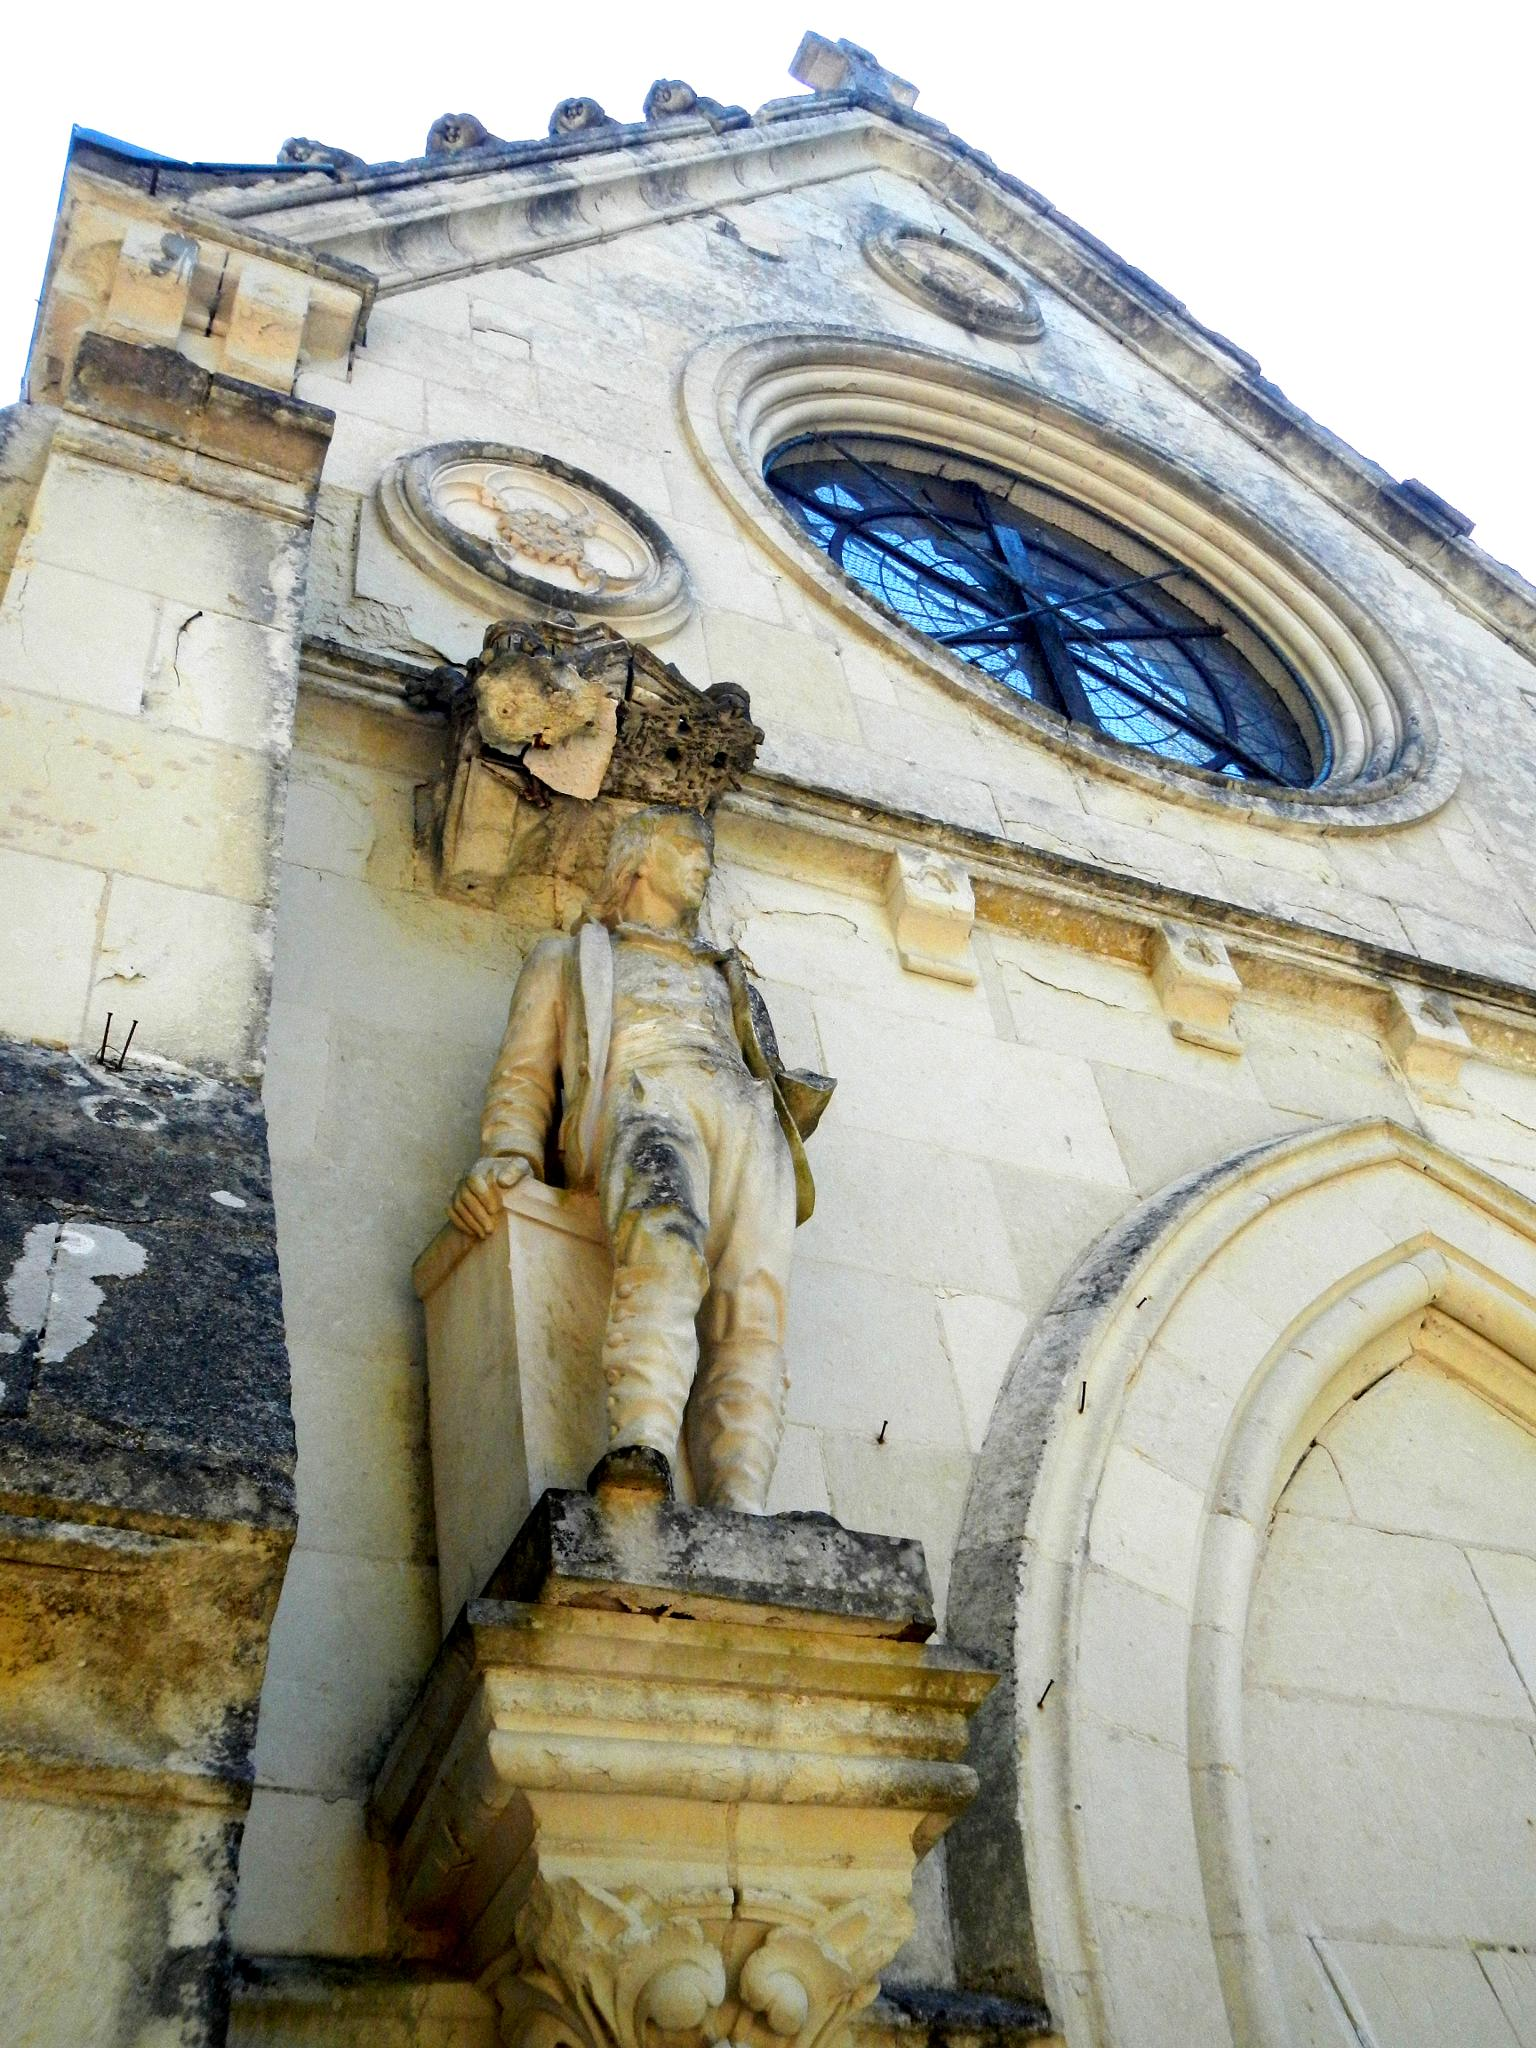 Cimetière des Martyrs, France by pawel2reklewski